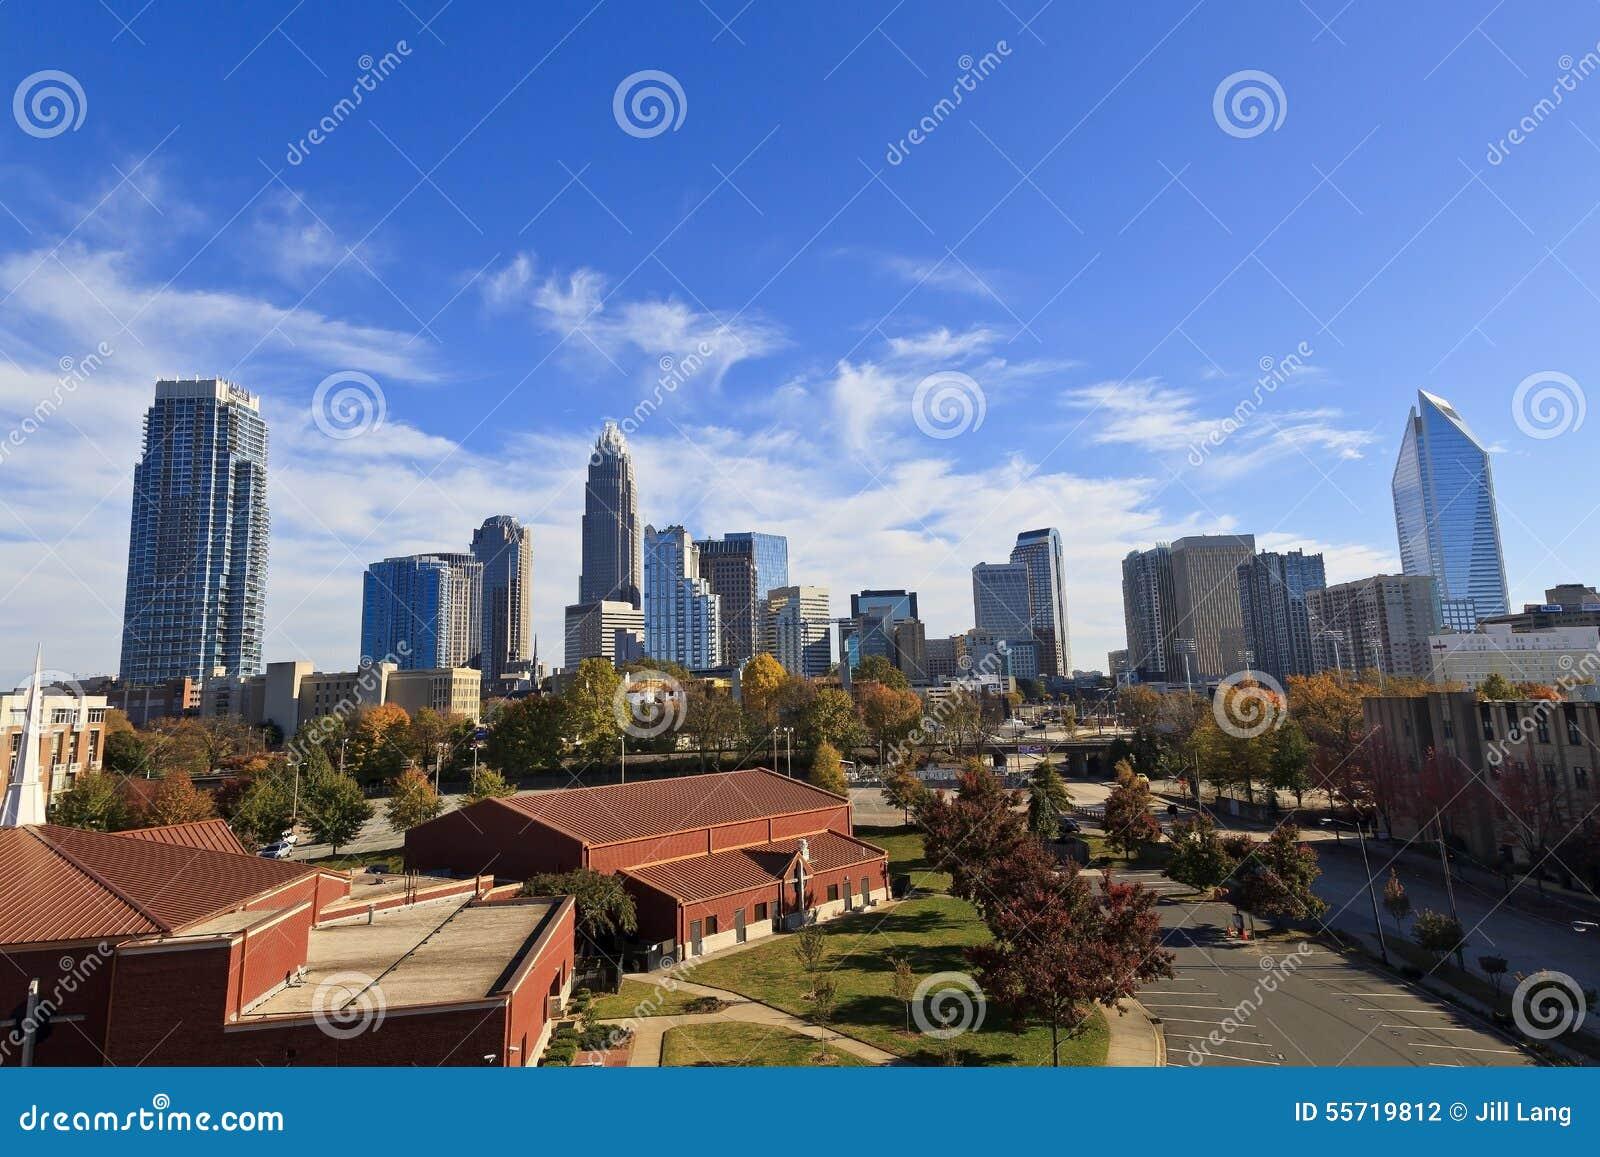 North carolina usa november 9 2014 skyline view of charlotte nc